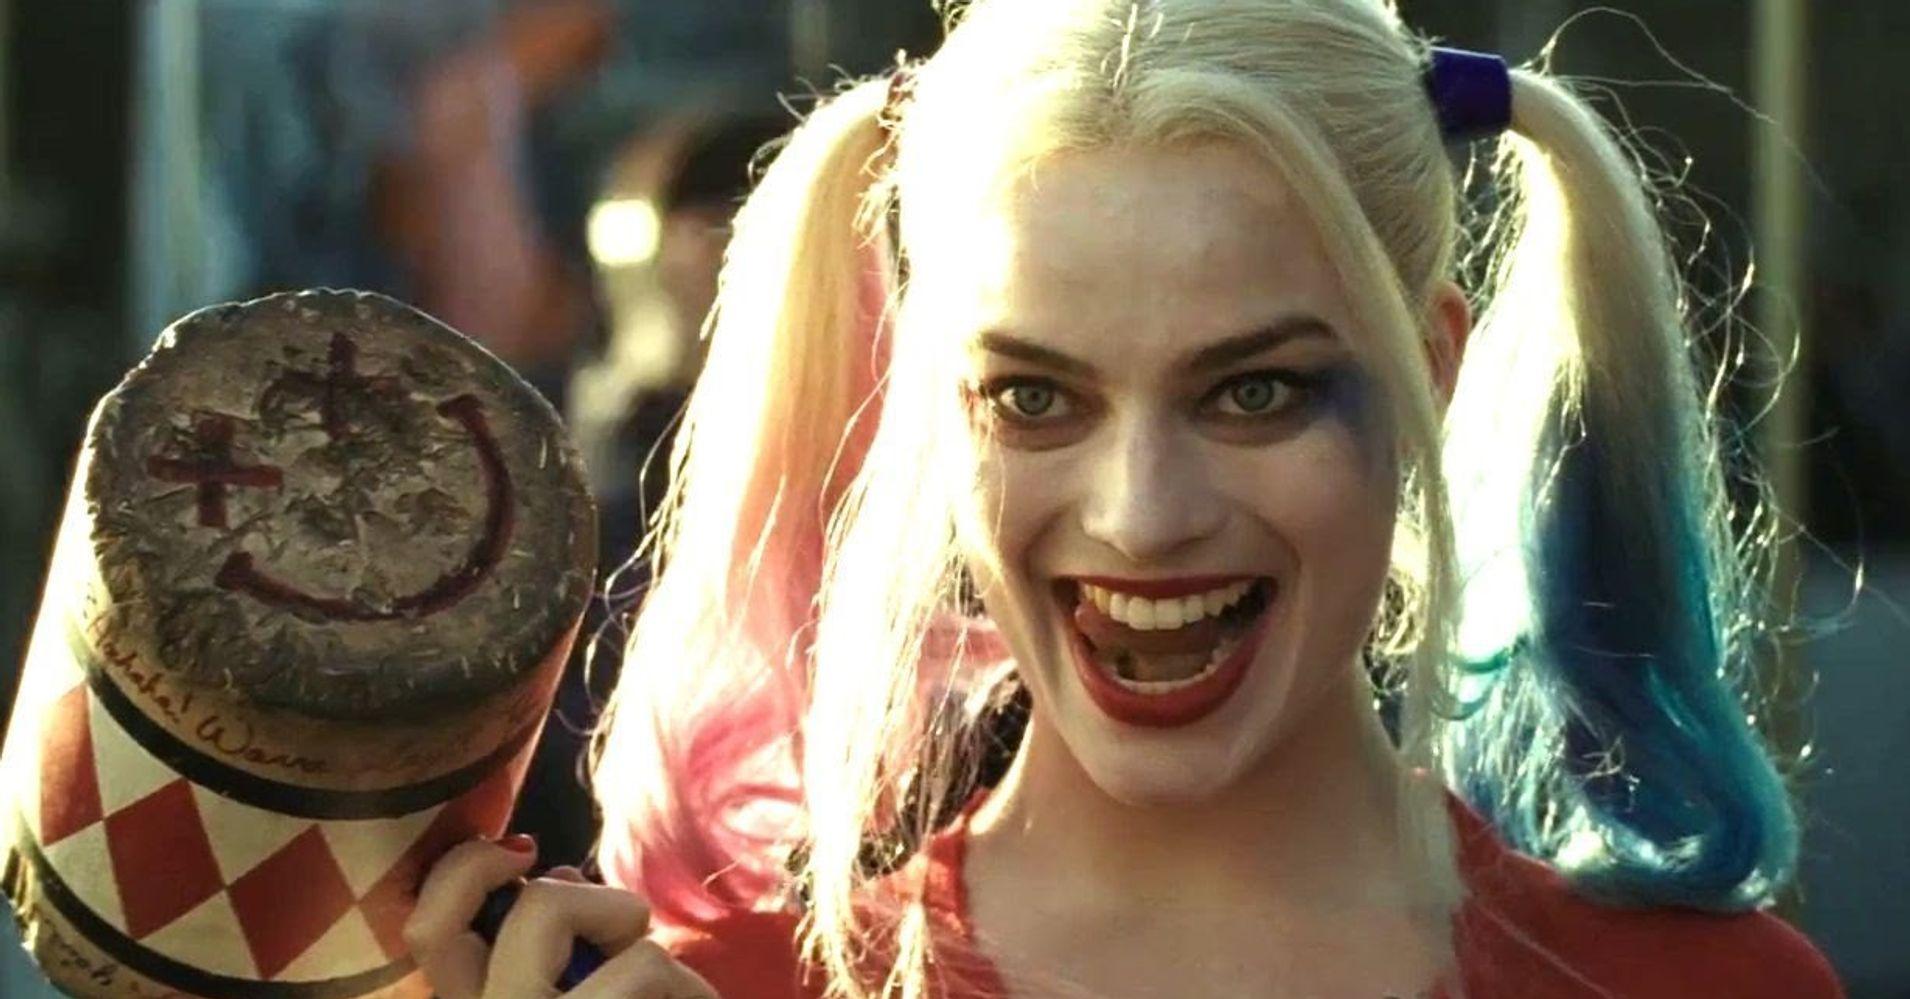 Margot Robbie werkt aan films over Harley Quinn